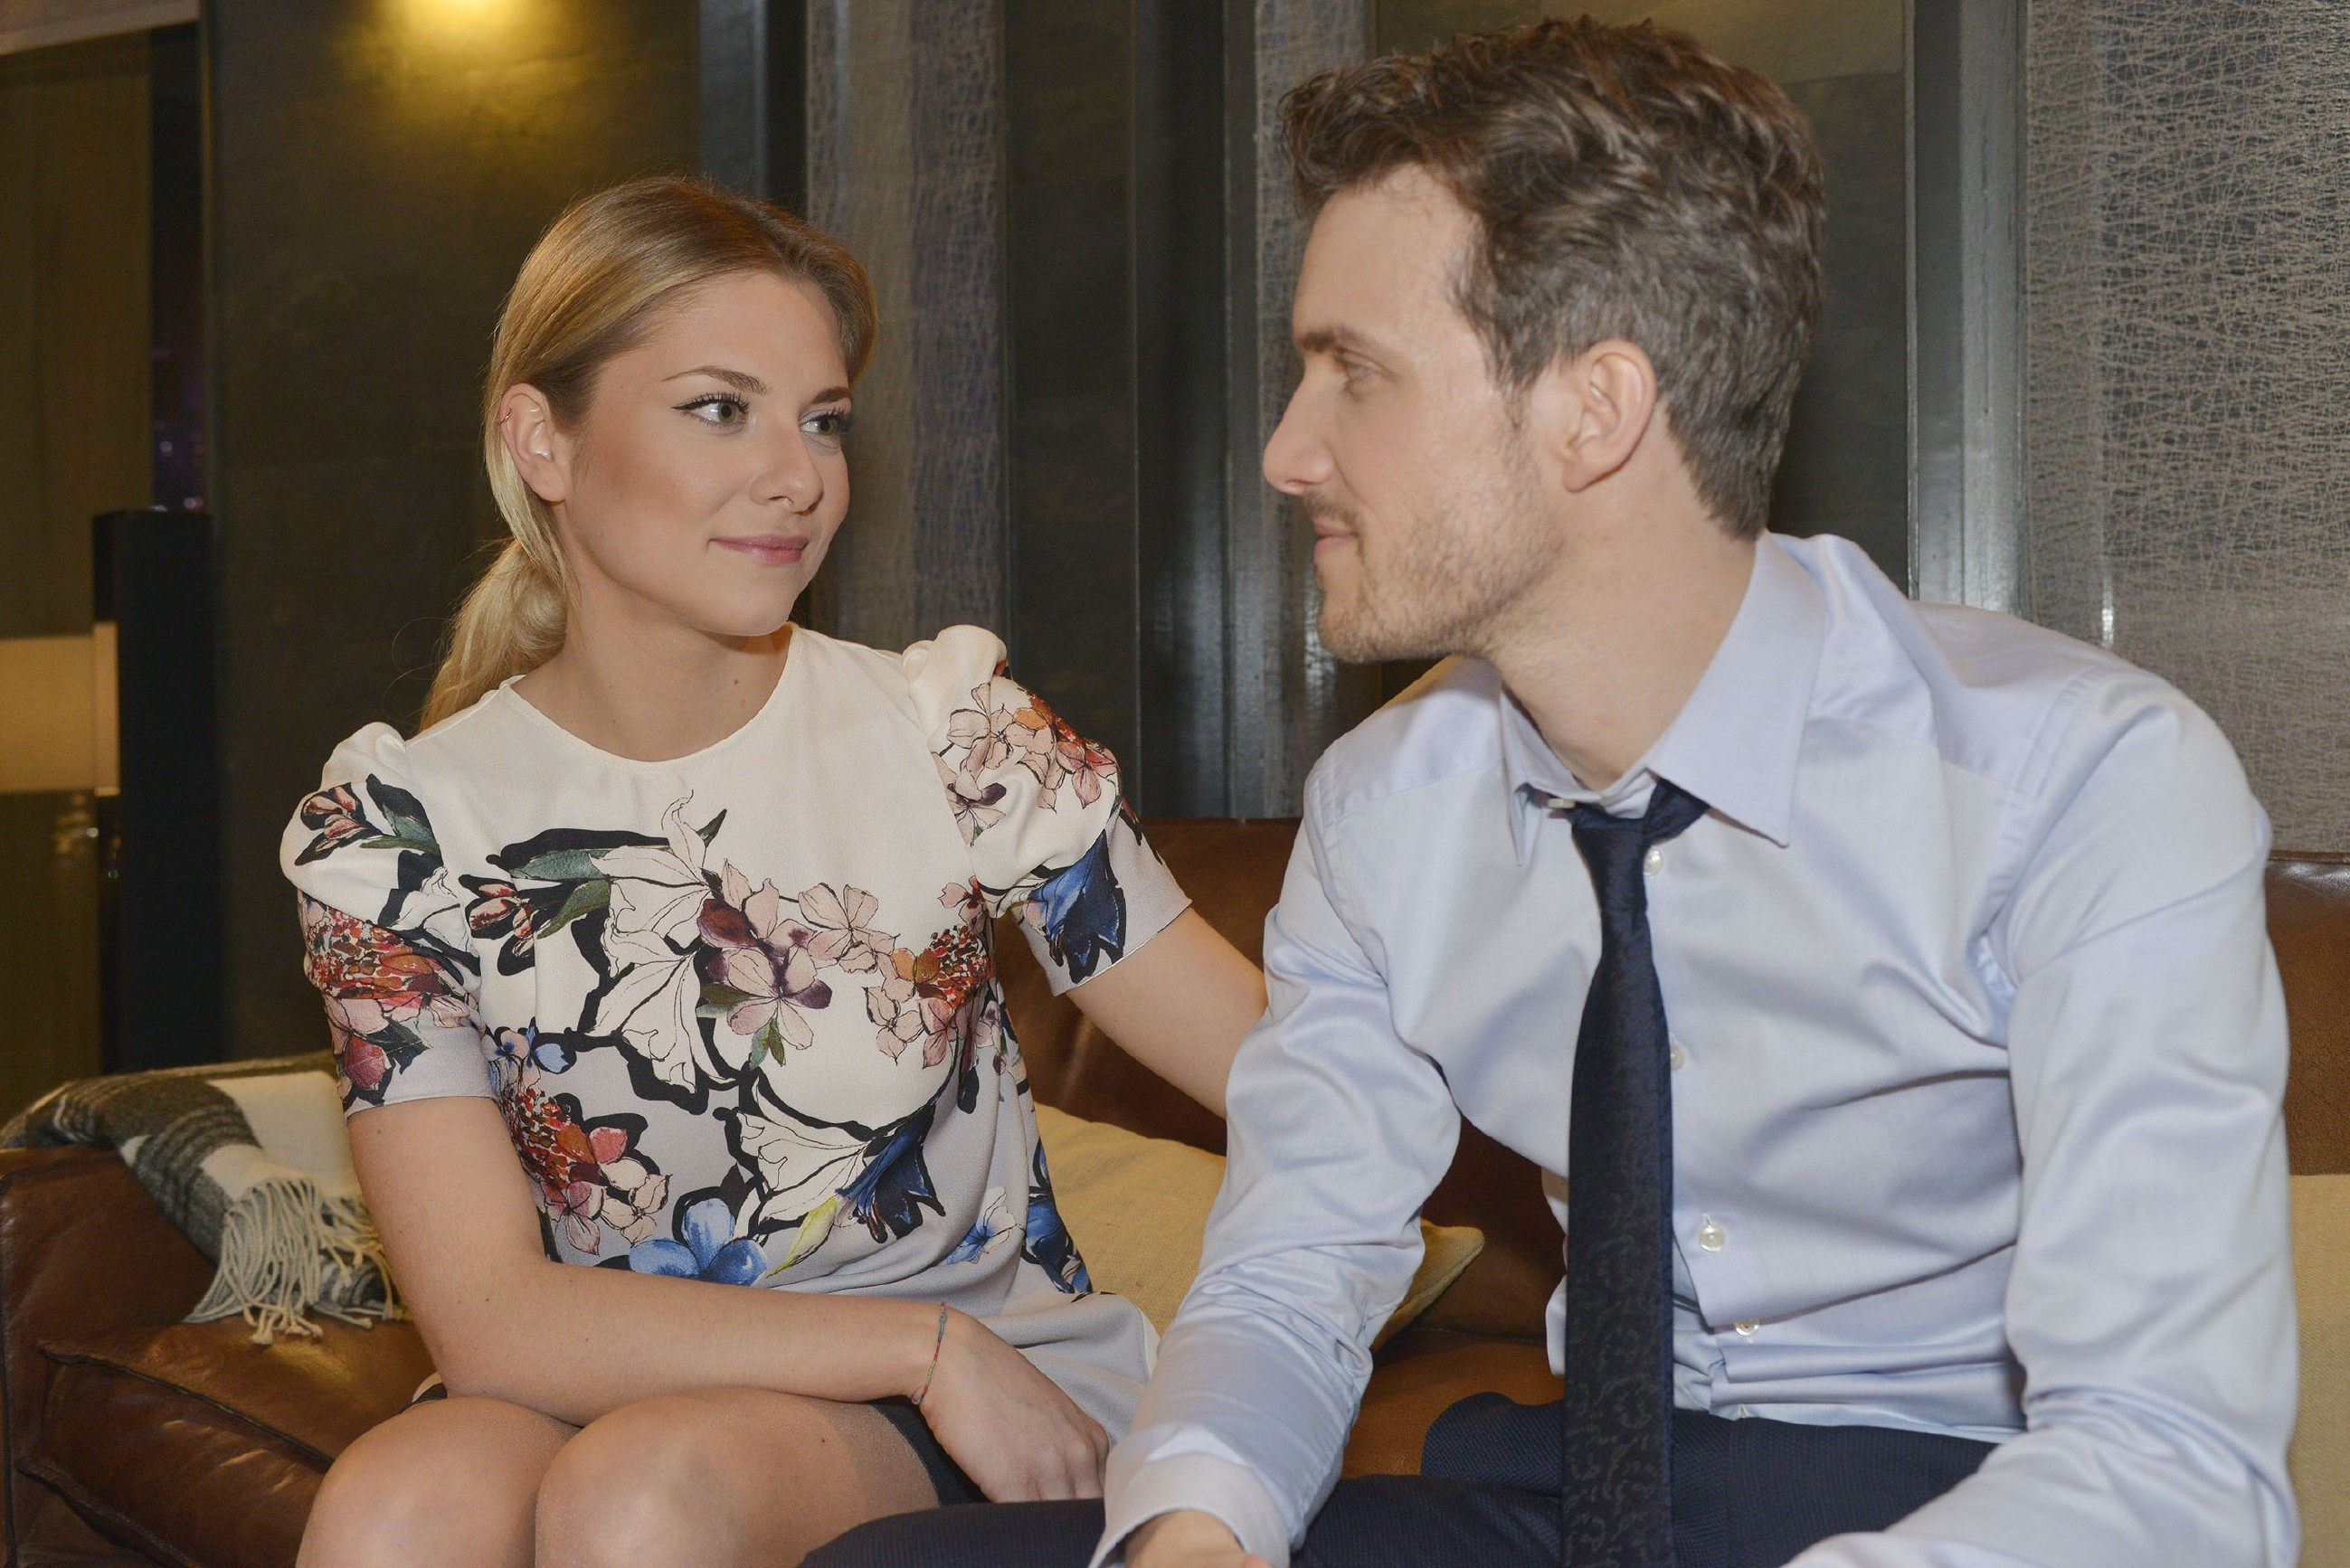 Felix (Thaddäus Meilinger) ist froh, dass Sunny (Valentina Pahde) ihm vertraut. (Quelle: RTL / Rolf Baumgartner)